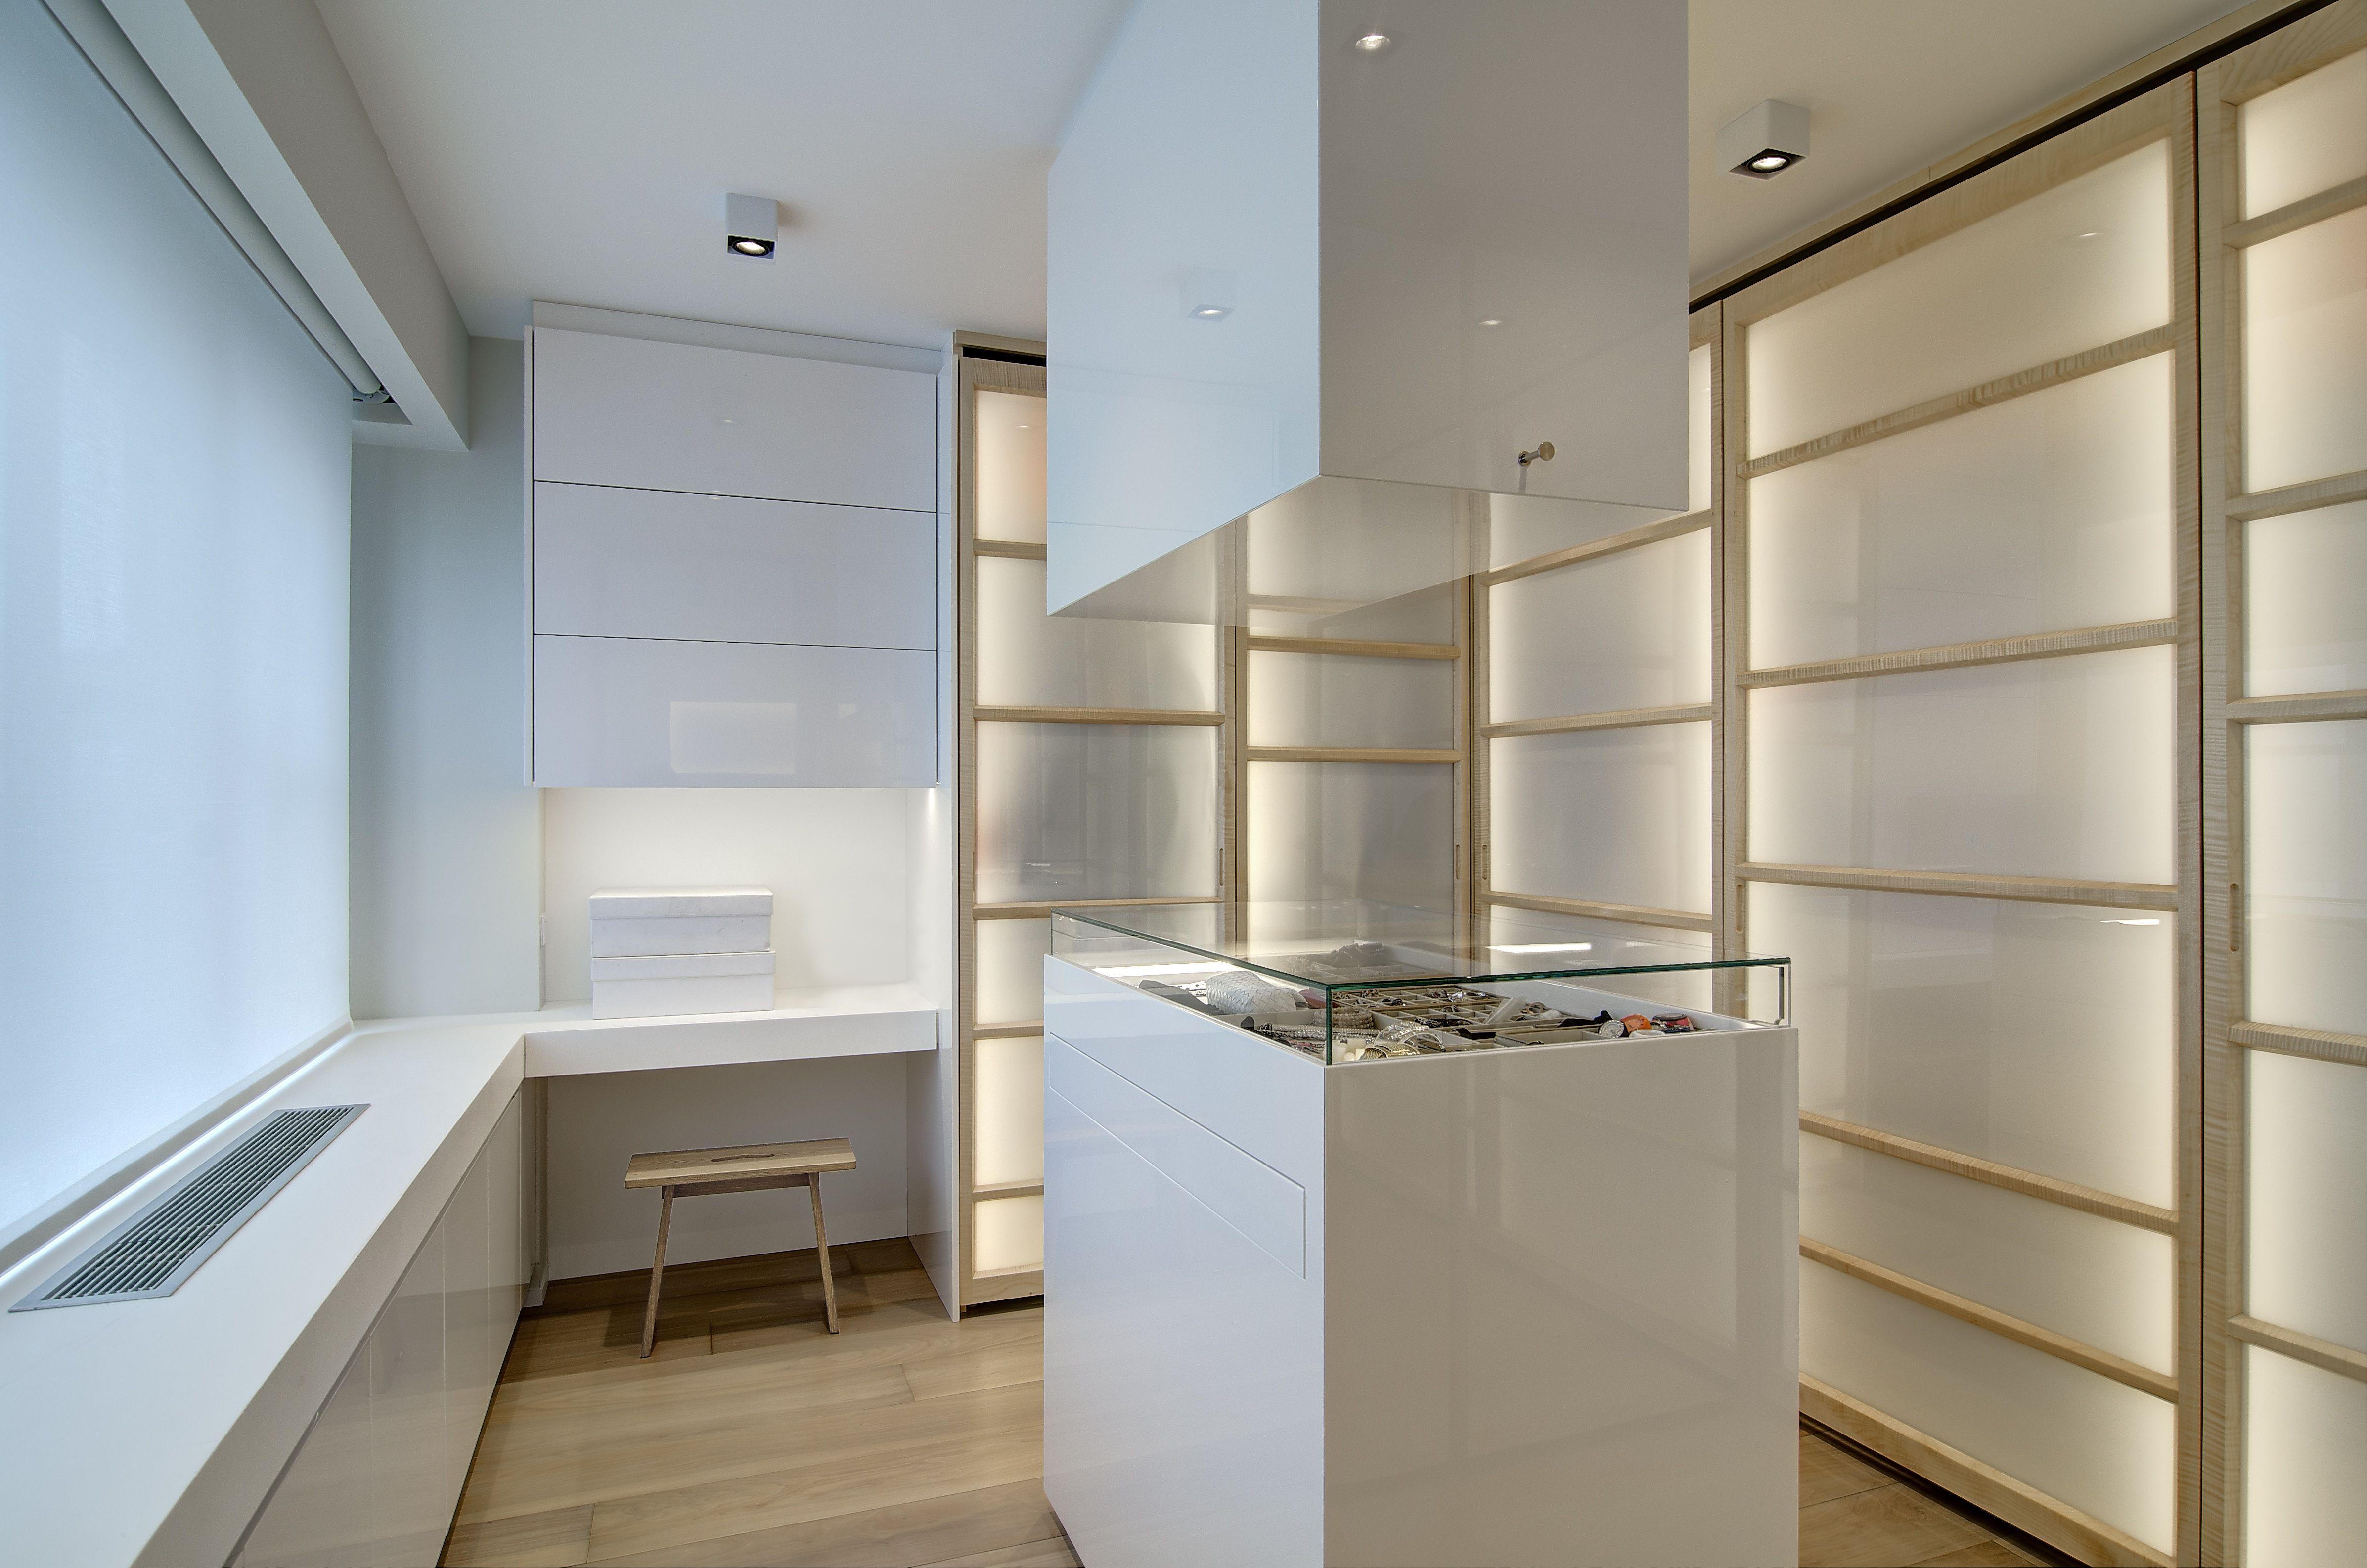 Cabina Armadio New York : Cabina armadio padronale in residenza privata ny arch. leopoldo